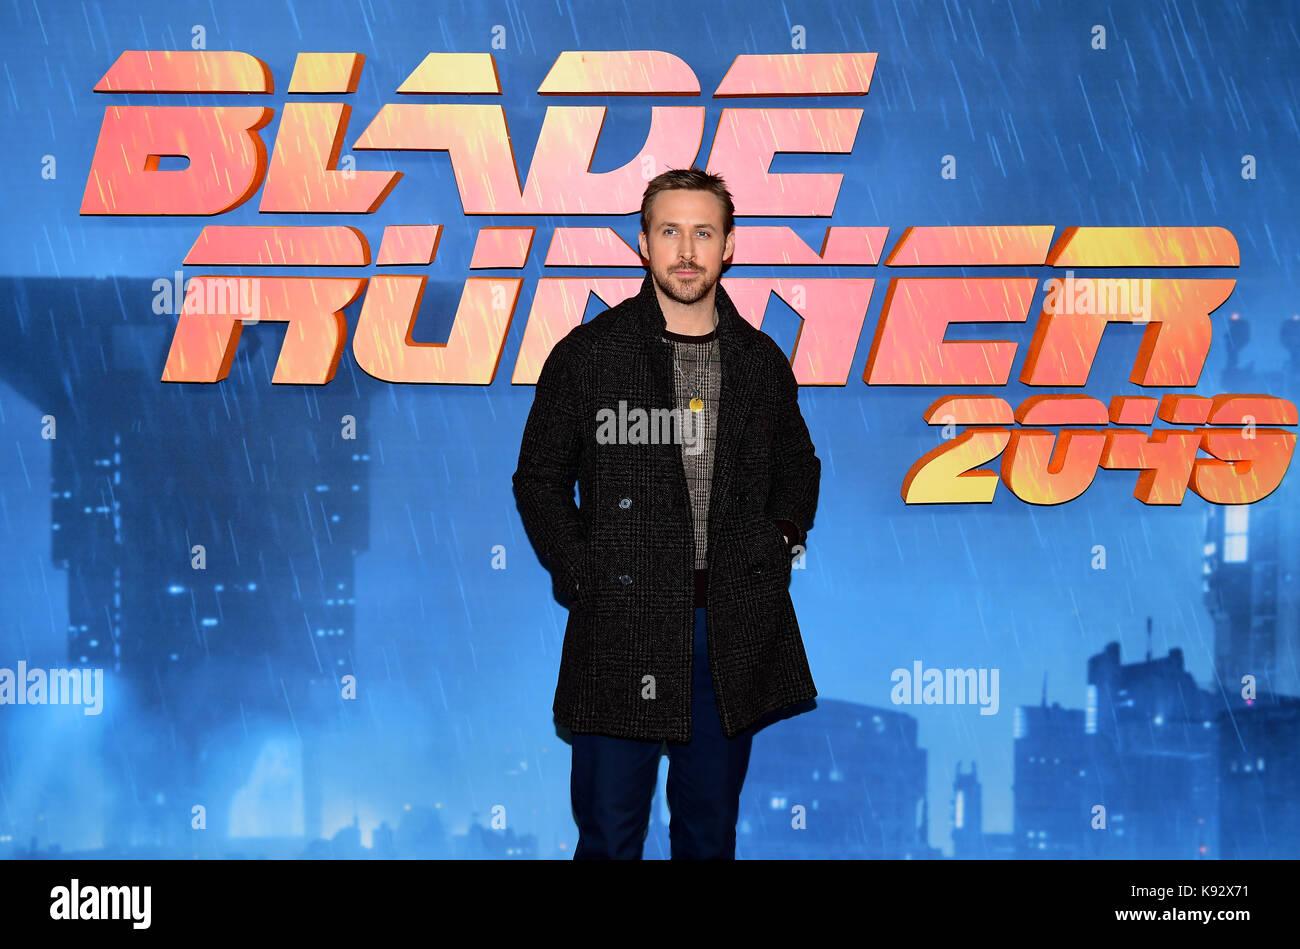 Ryan Gosling attending the Blade Runner 2049 photocall at the Corinthia Hotel, London. - Stock Image